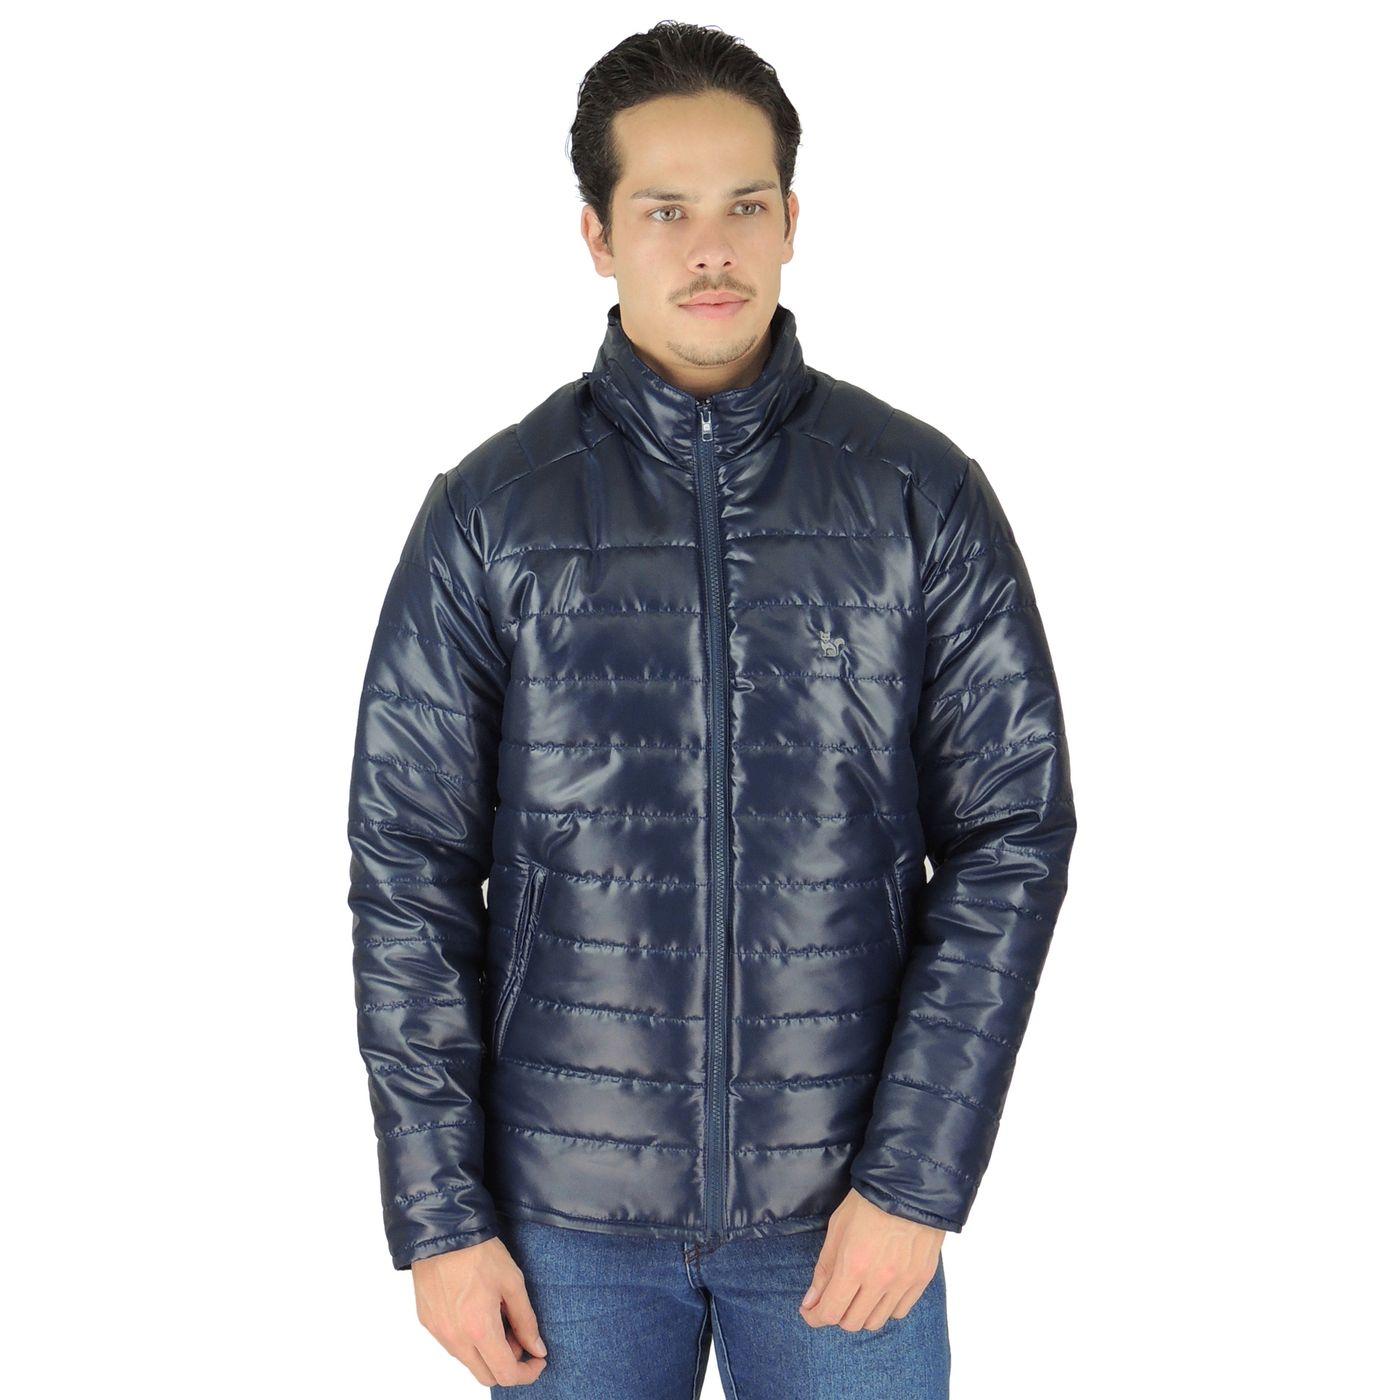 141dfd262 Casaco térmico masculino para o inverno e neve Alaska - fieroshop